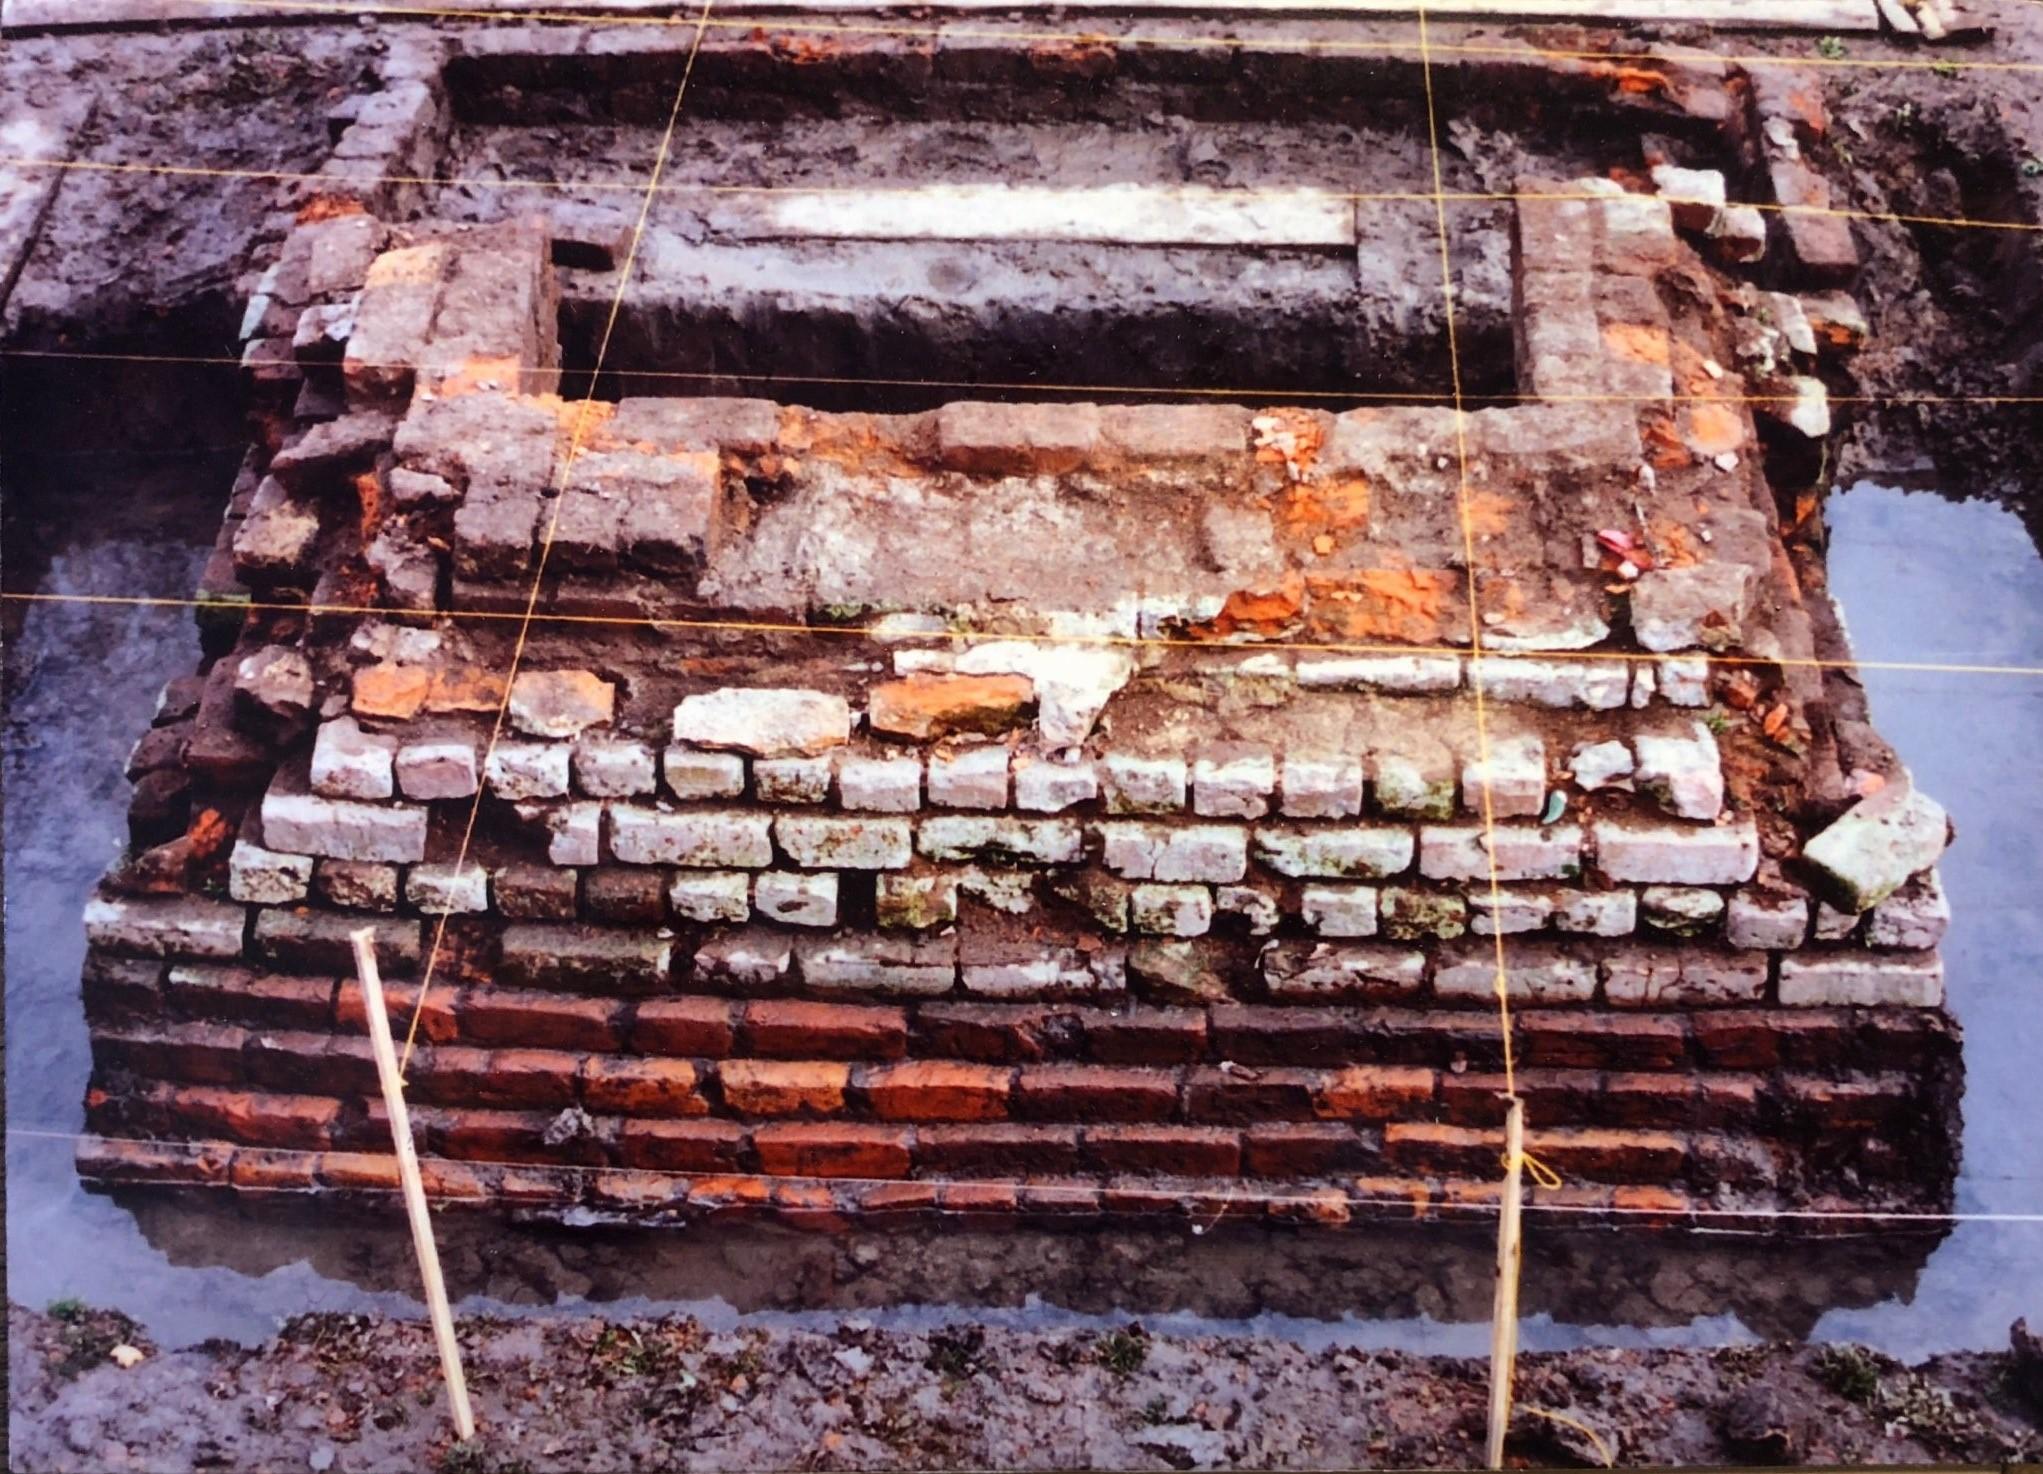 exposed base of hospital north chimney